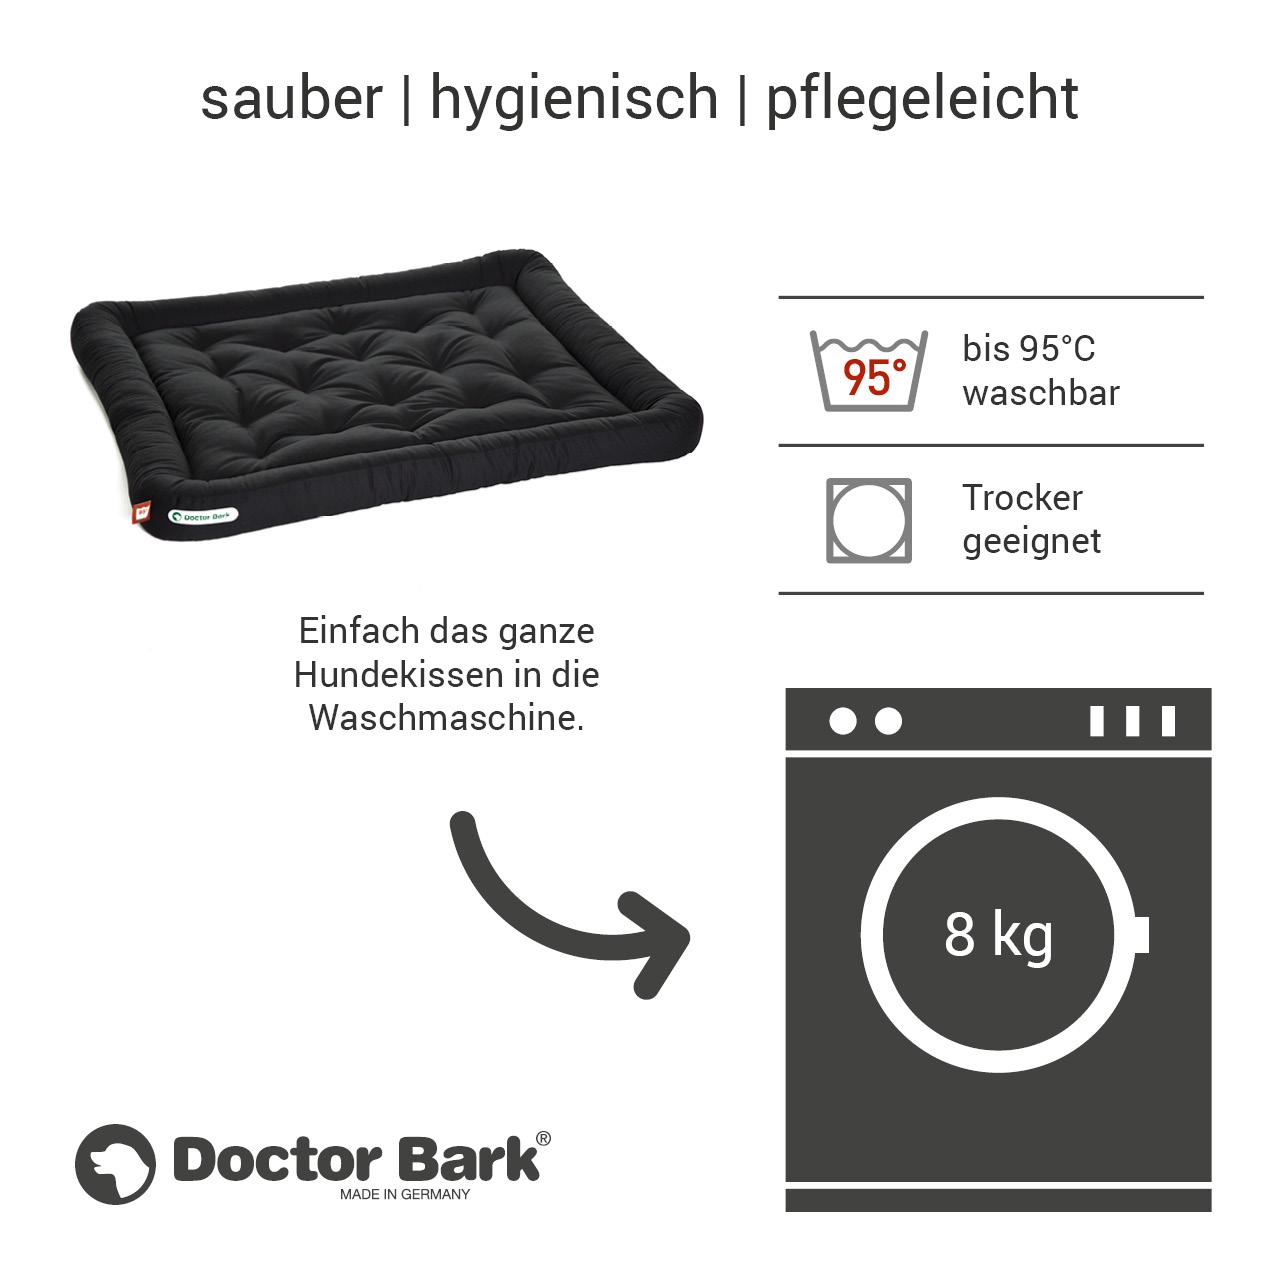 Lounge-Hundekissen / Hundebett orthopädisch Doctor Bark waschbar schwarz - Gr. XL